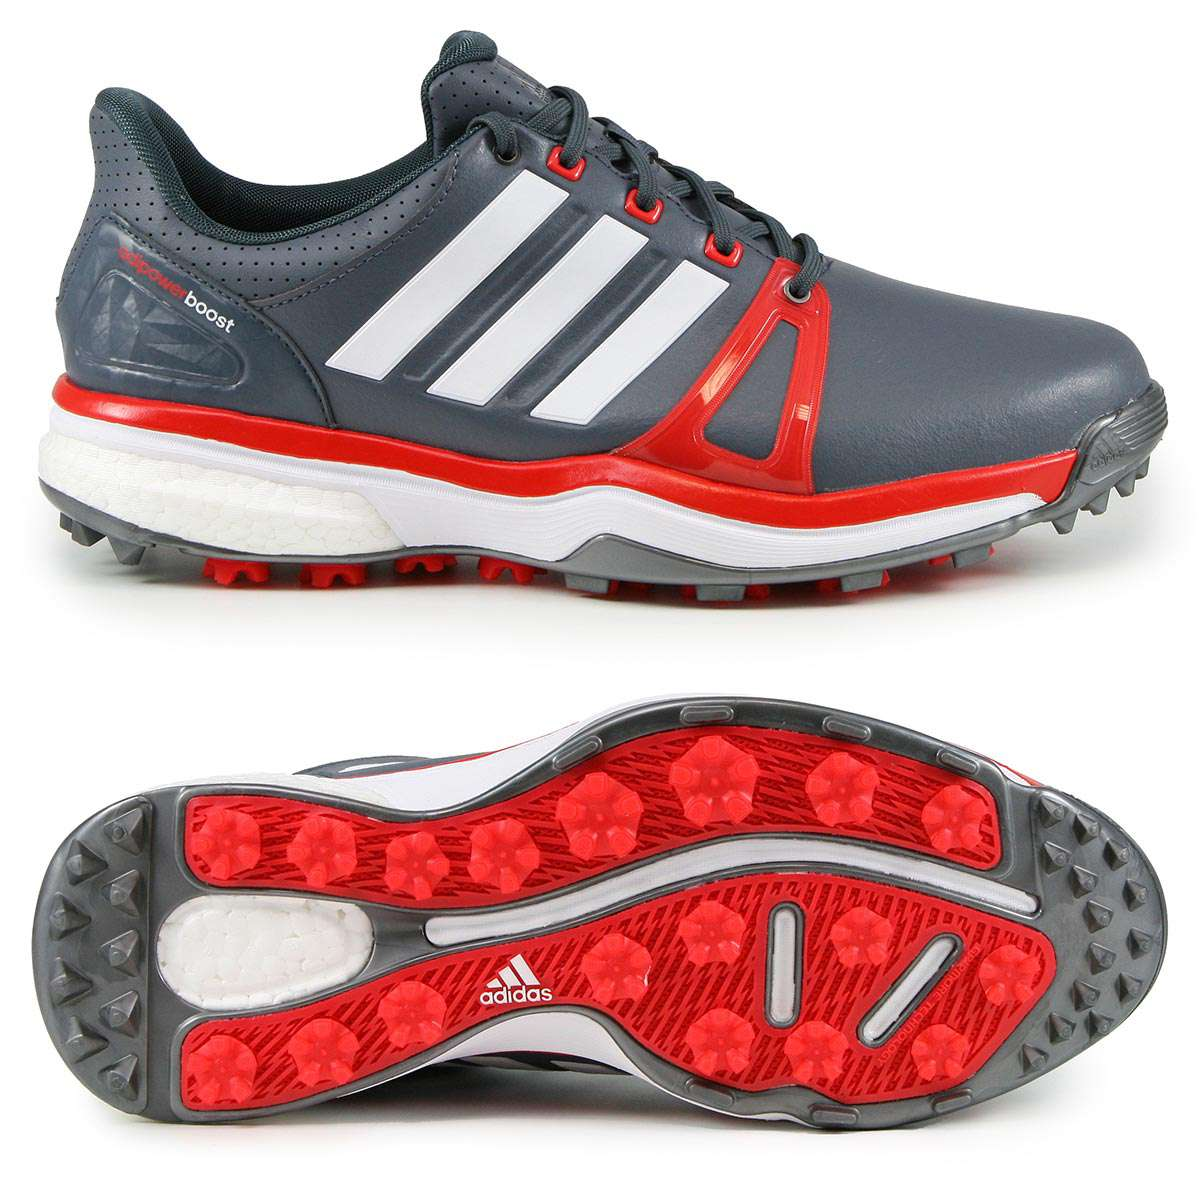 exclusive range best sneakers first rate Adidas adipower Boost 2 Herren Golfschuhe, WIDE, Dunkelgrau / Rot / Weiß